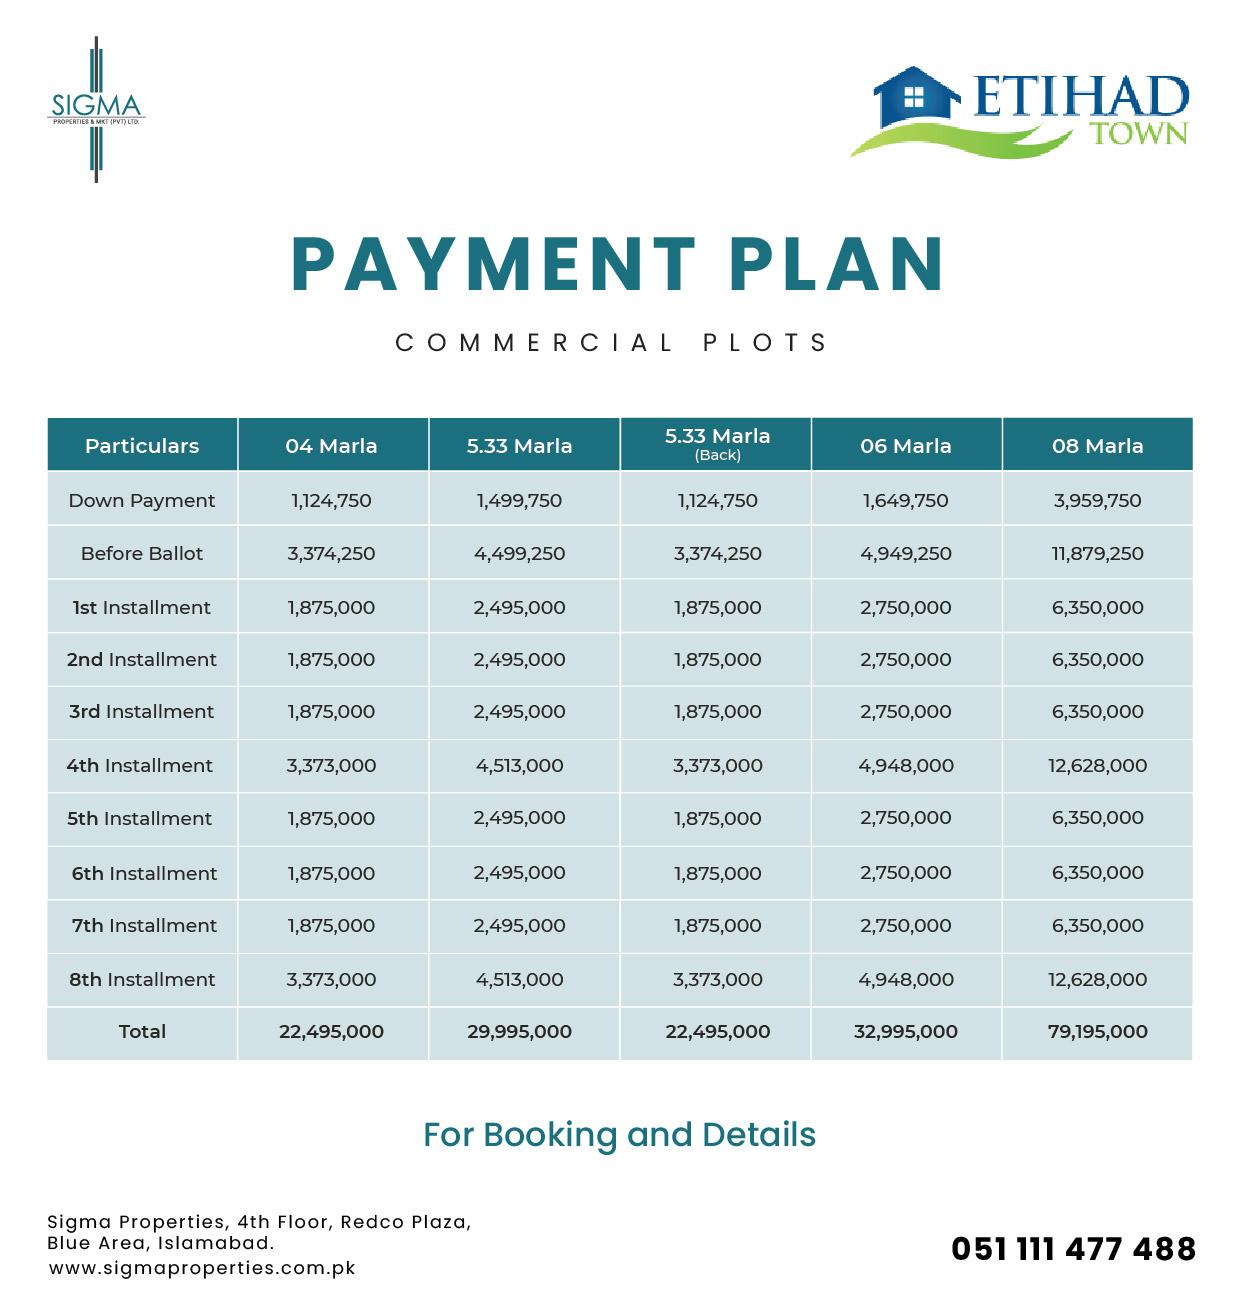 Etihad Town commercial plot payment plan